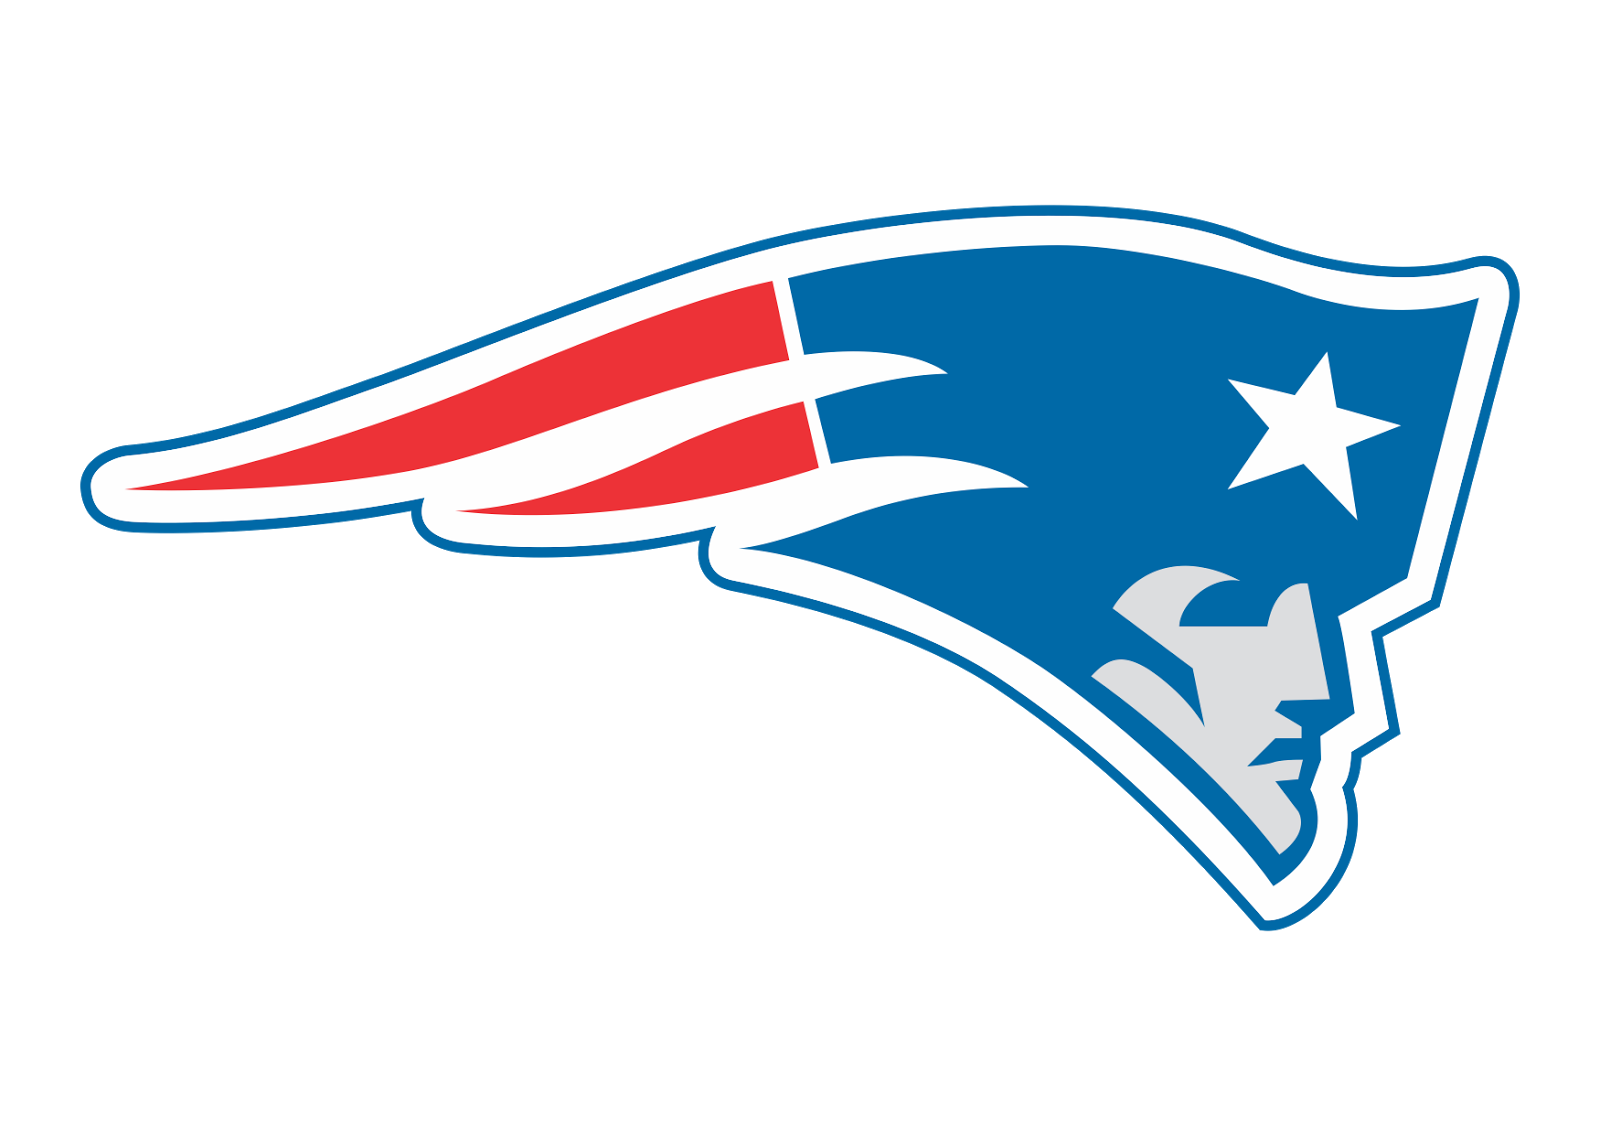 Download New England Patriots Logo Vector ~ Format Cdr, Ai, Eps ...